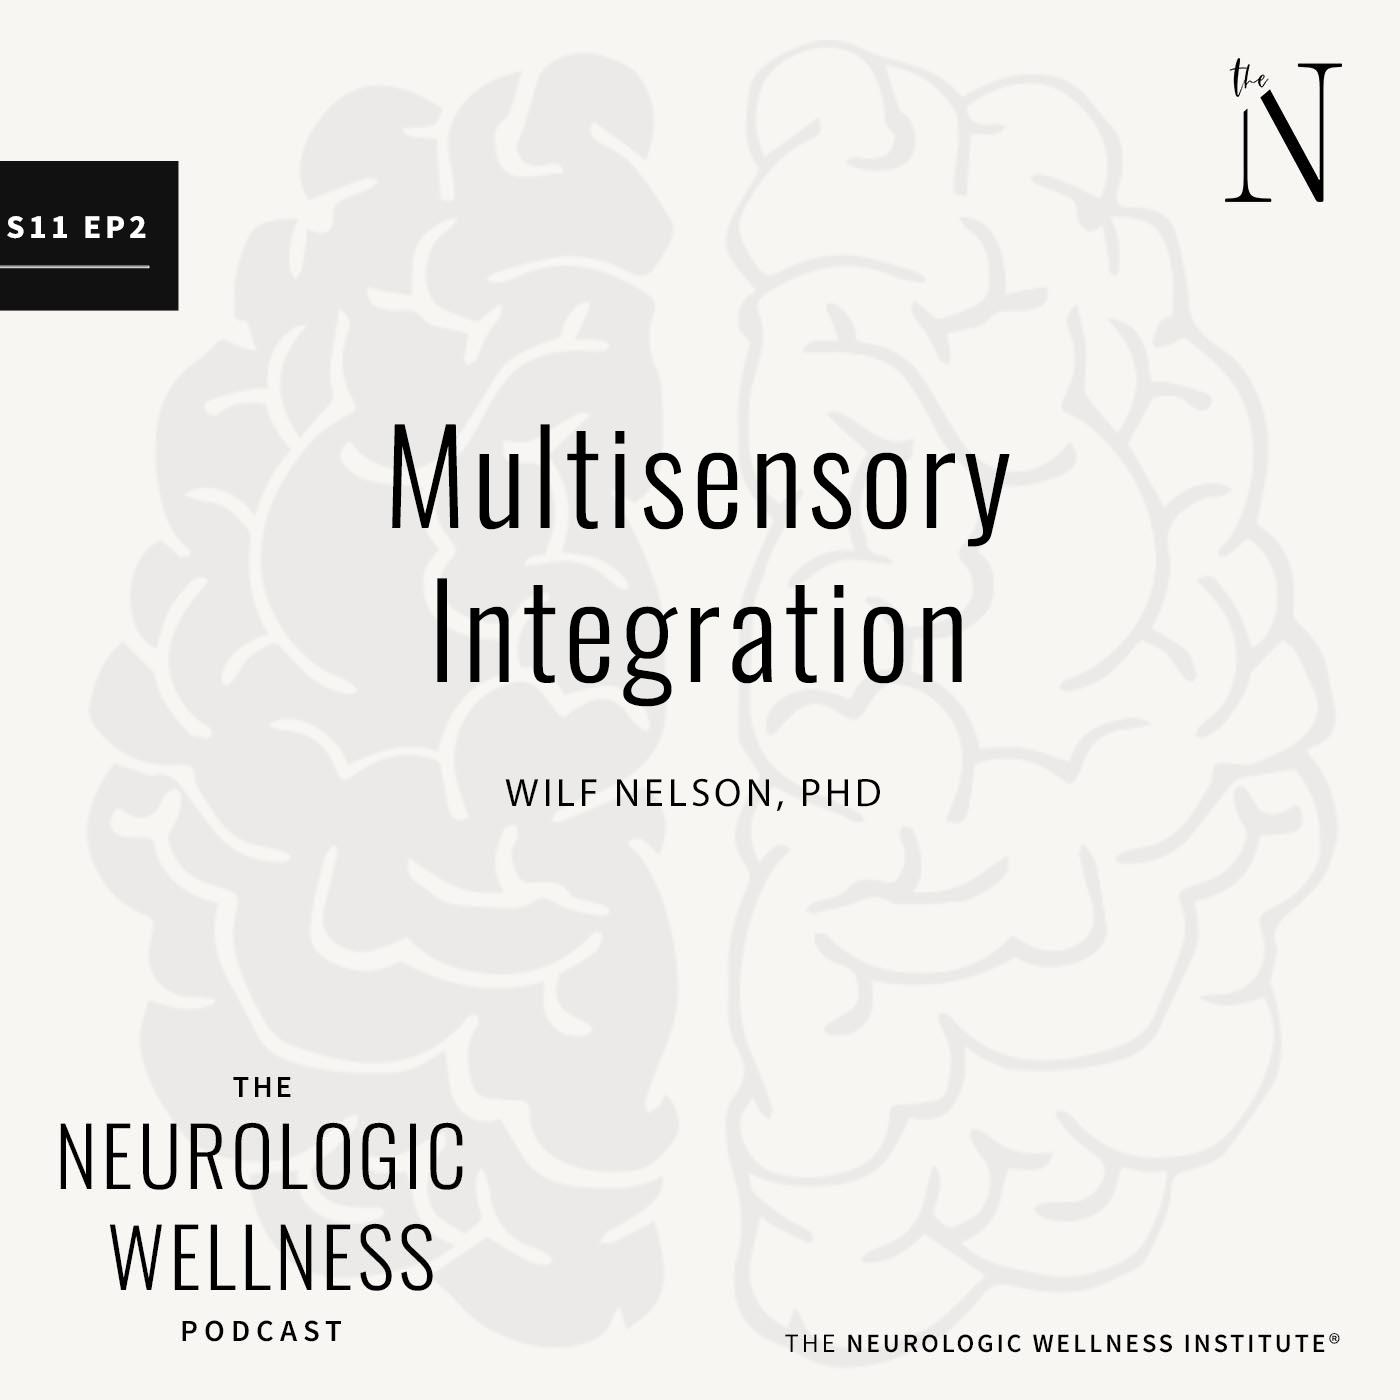 Multisensory Integration